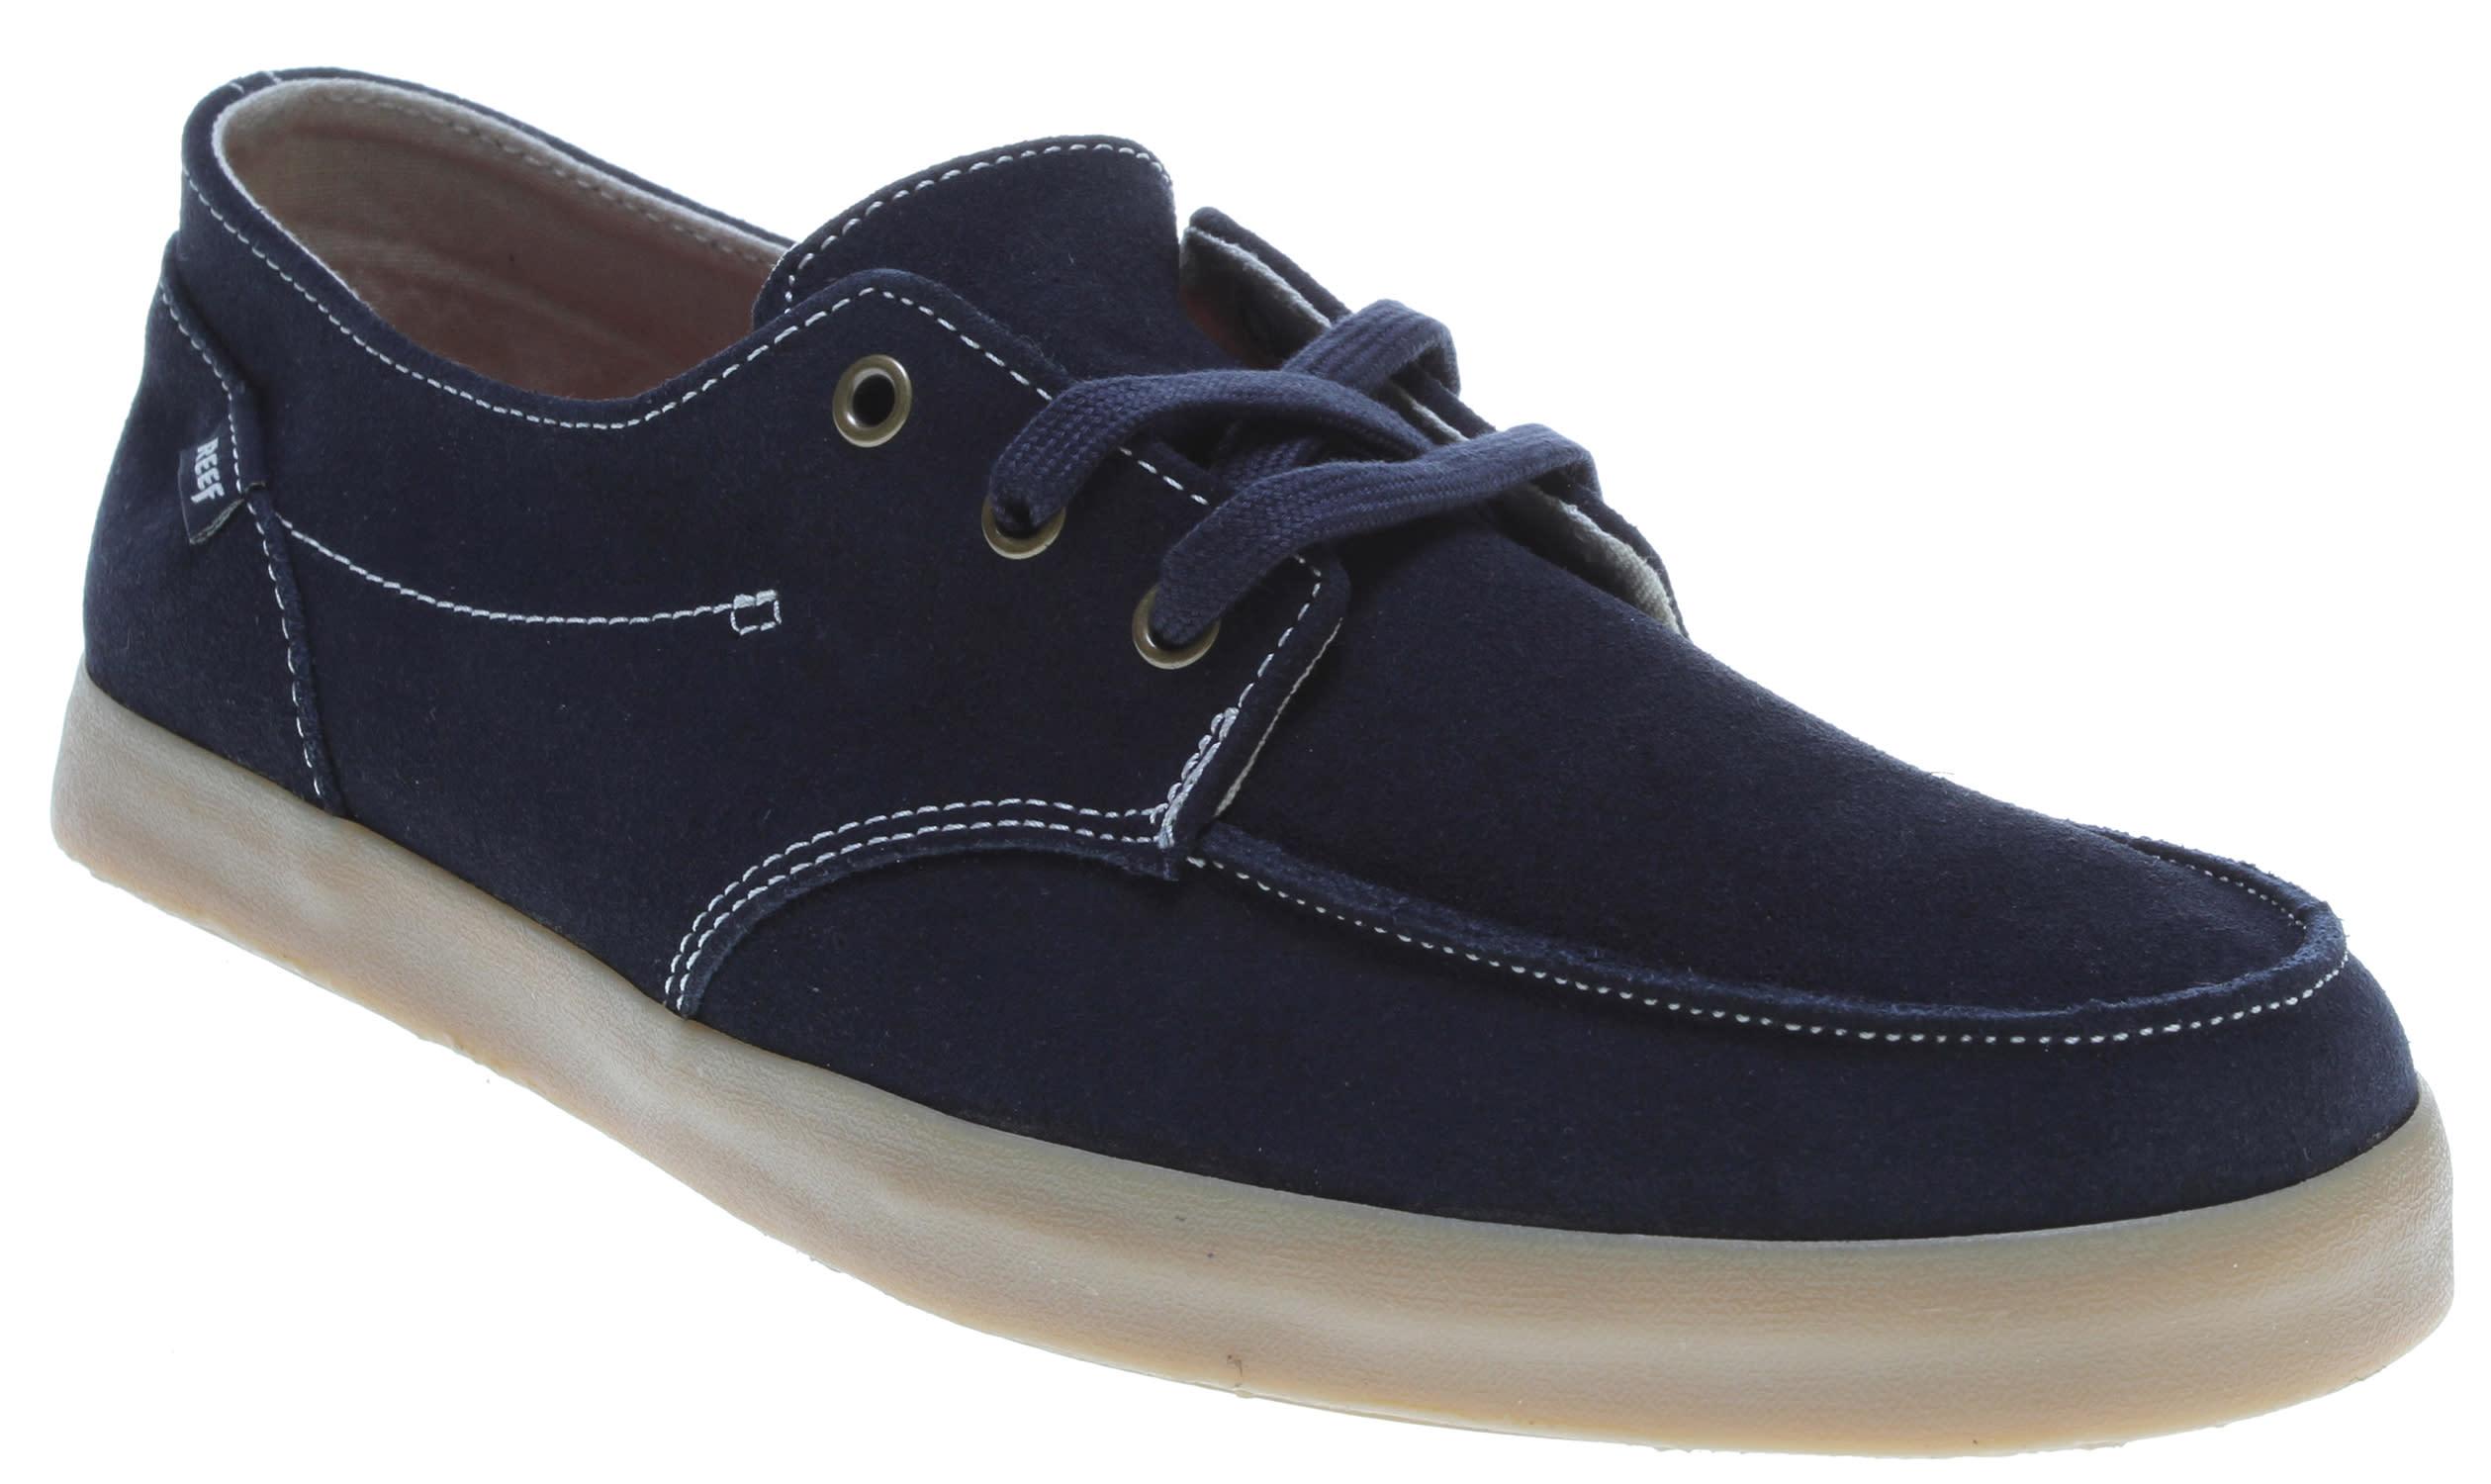 9bfdece4ce177 Reef Deck Hand 2 LE Shoes - thumbnail 2